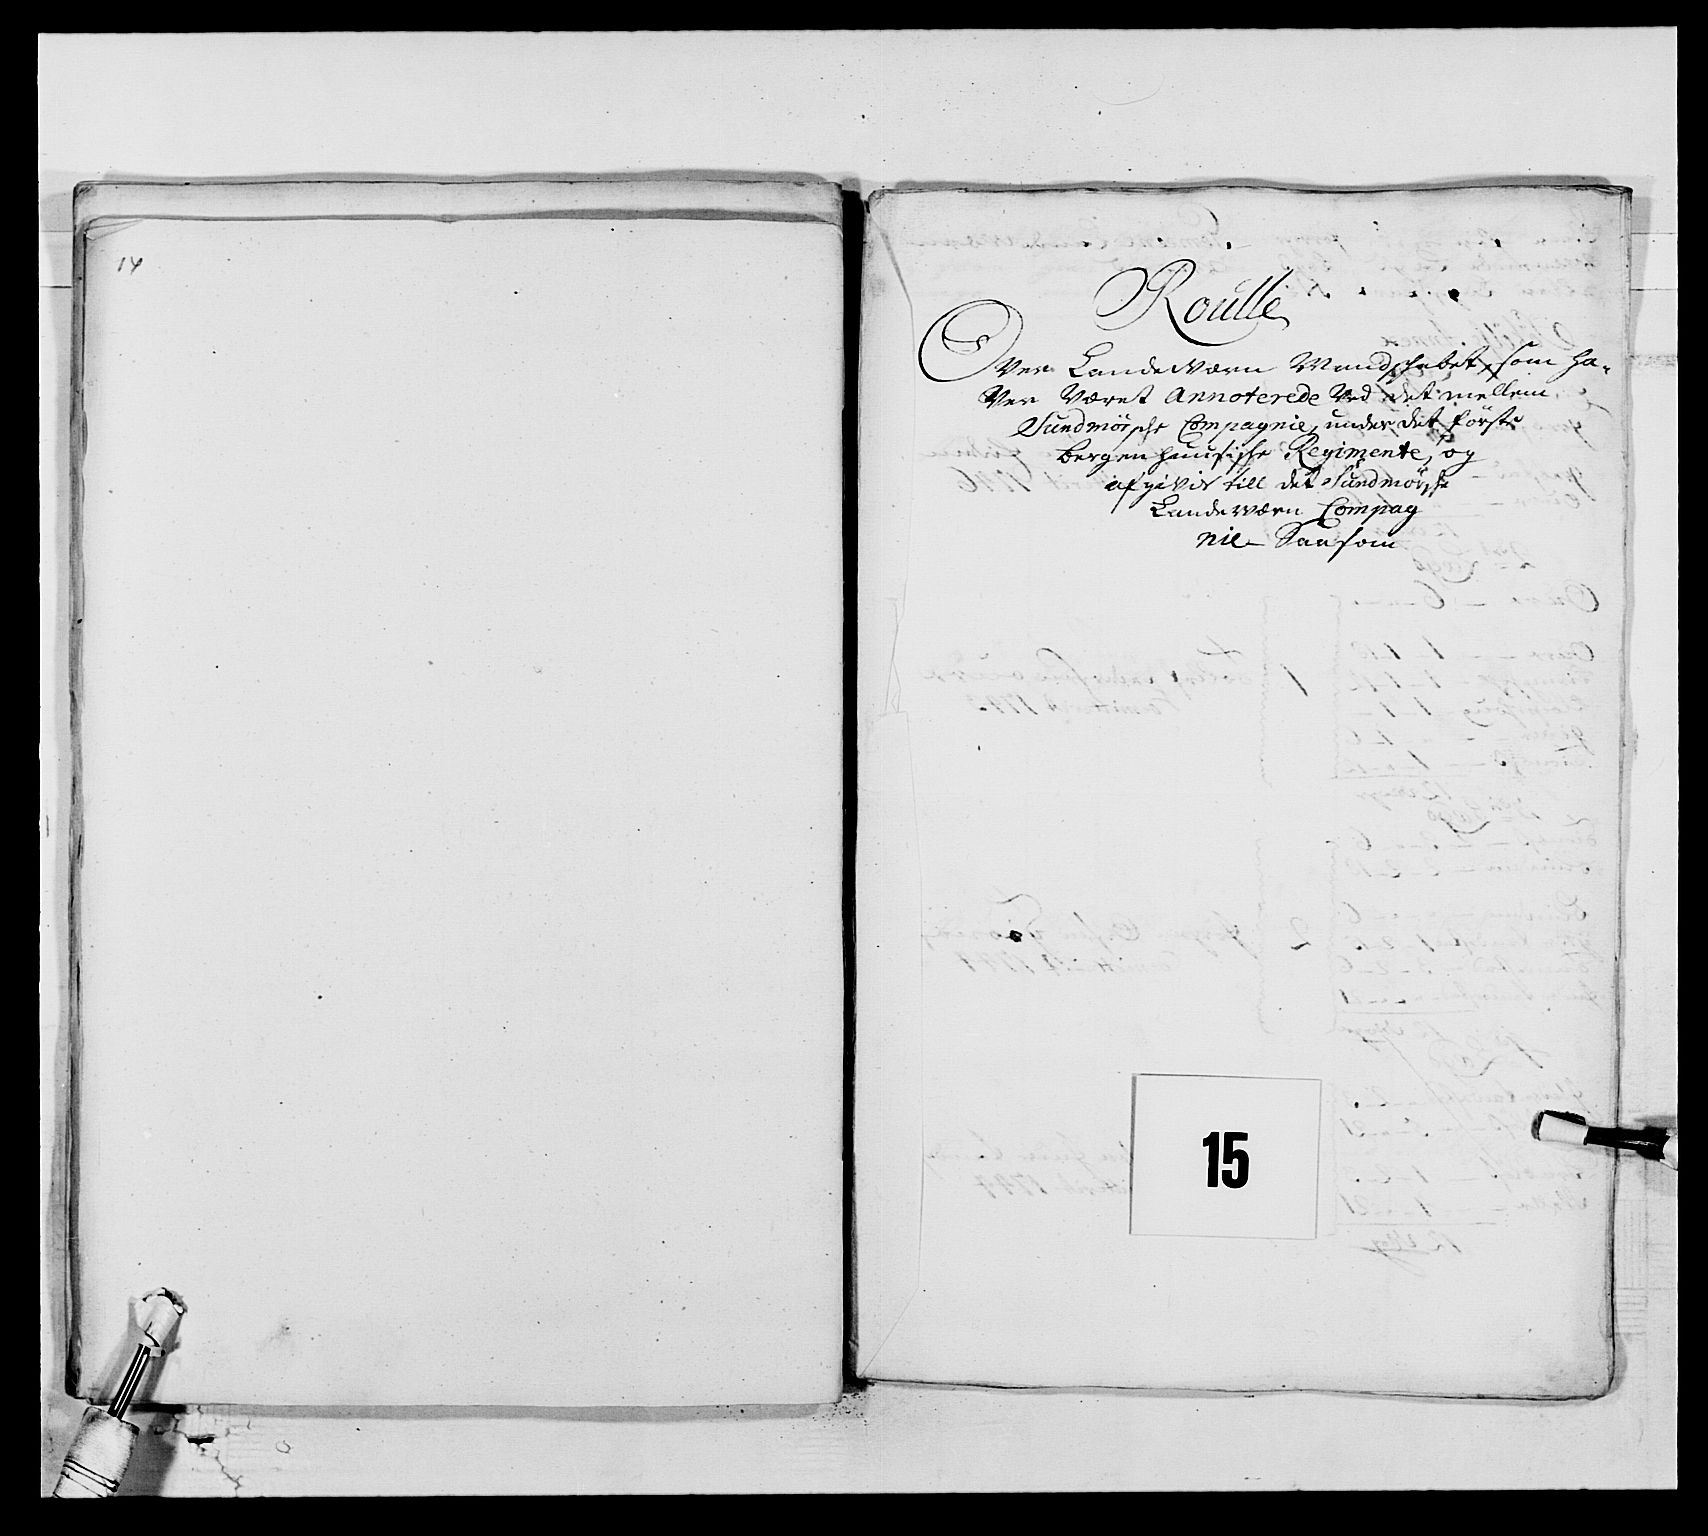 RA, Kommanderende general (KG I) med Det norske krigsdirektorium, E/Ea/L0517: 1. Bergenhusiske regiment, 1742-1756, s. 138